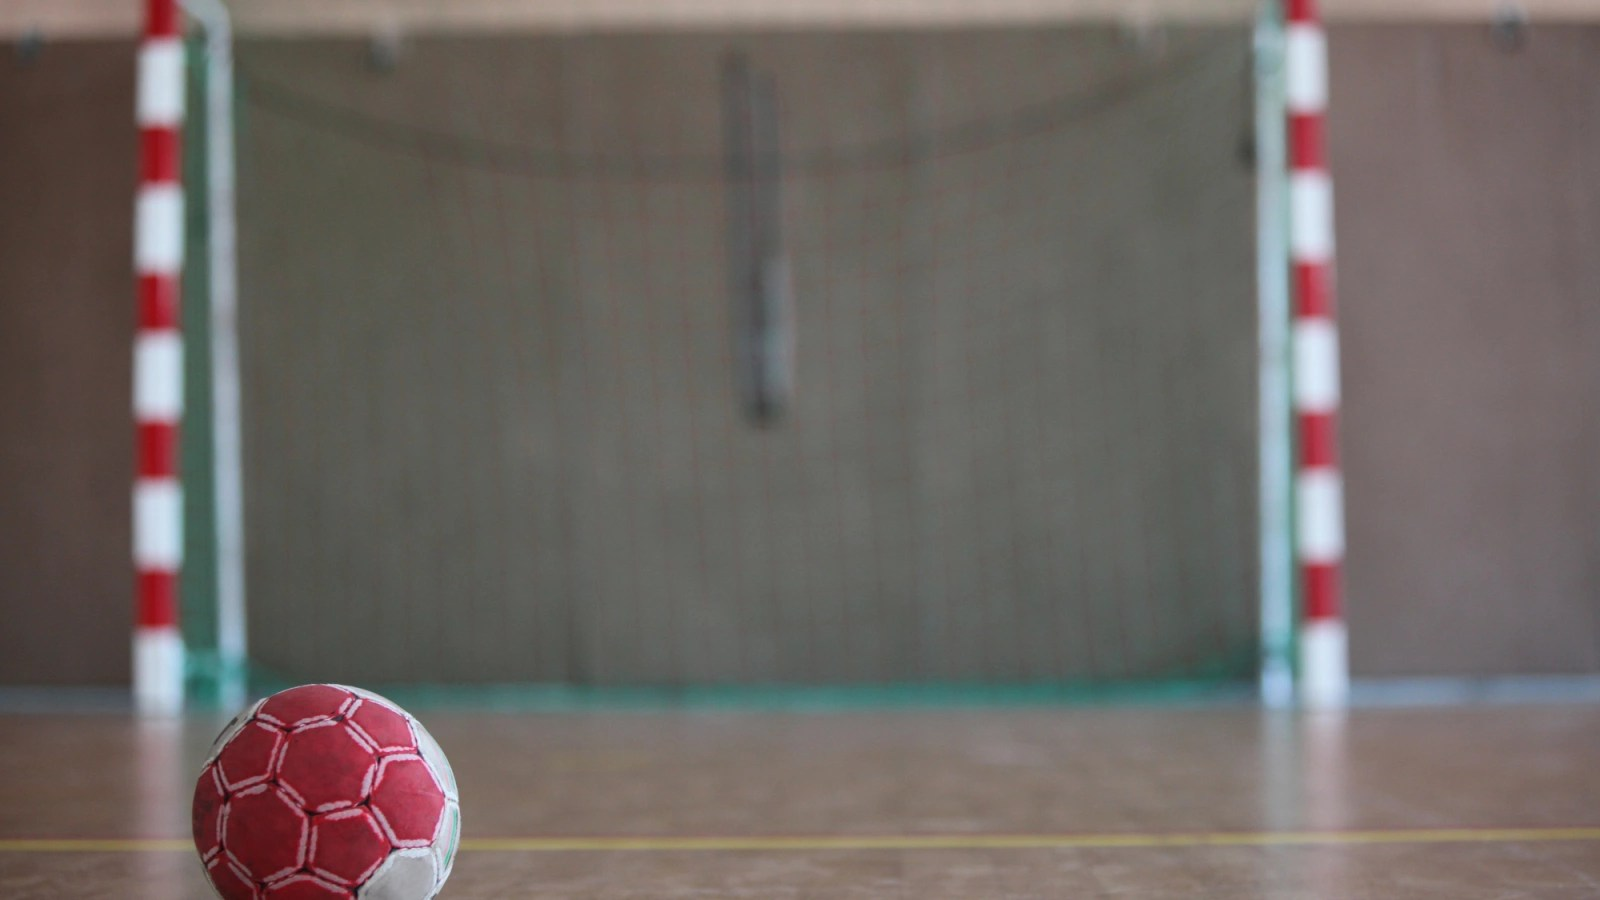 handball wm 2021 finale gratis im live